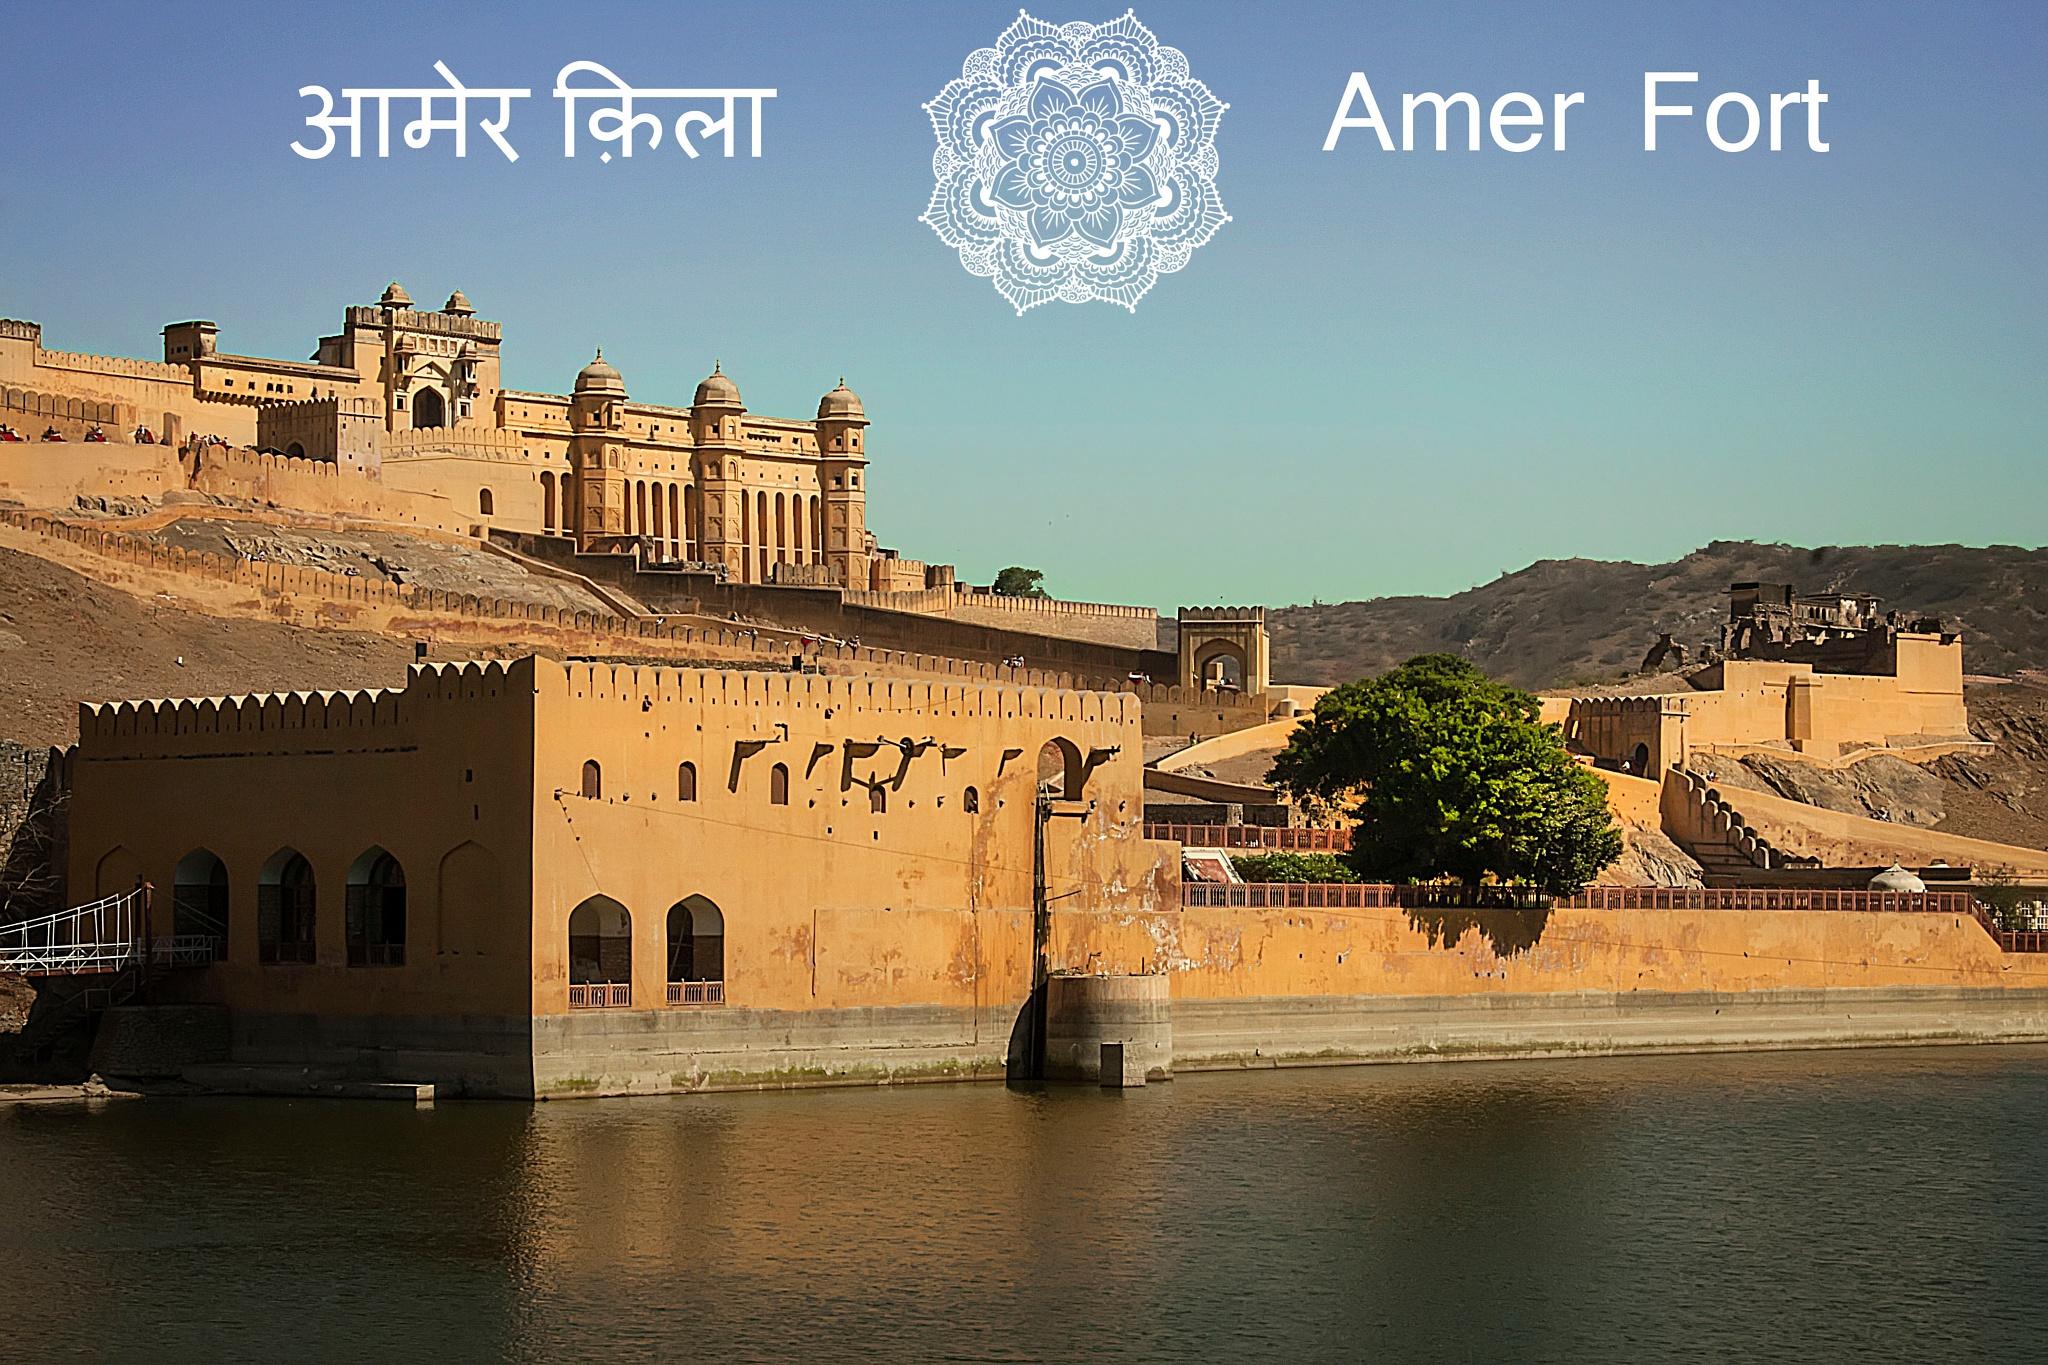 Amer Fort Jaipur by Willpower